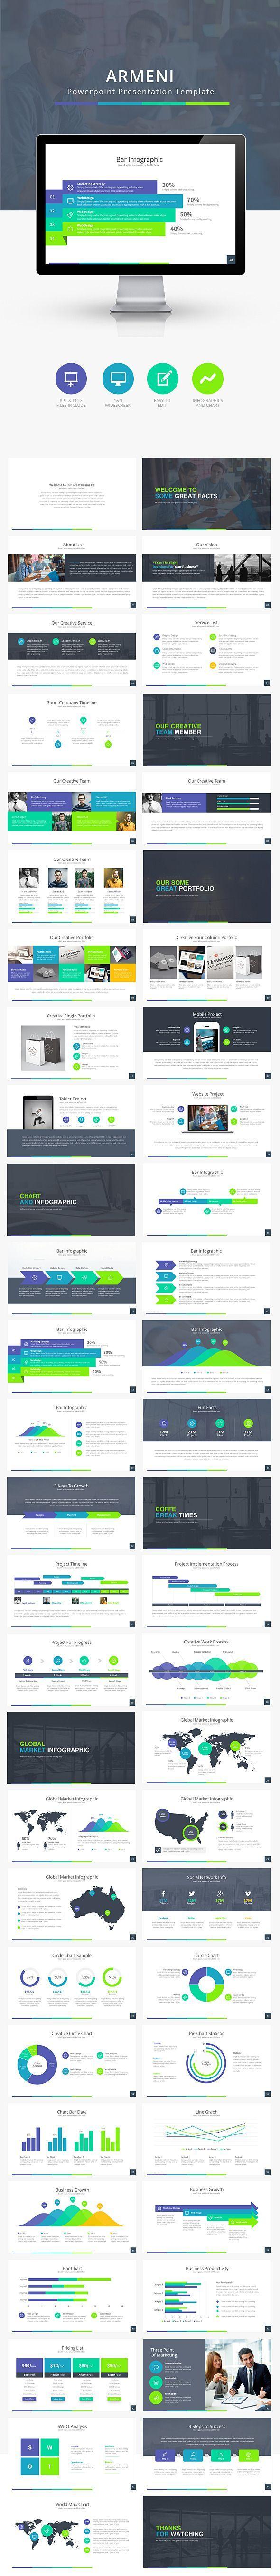 Armeni Powerpoint Presentation Template (Powerpoint Templates) Preview: